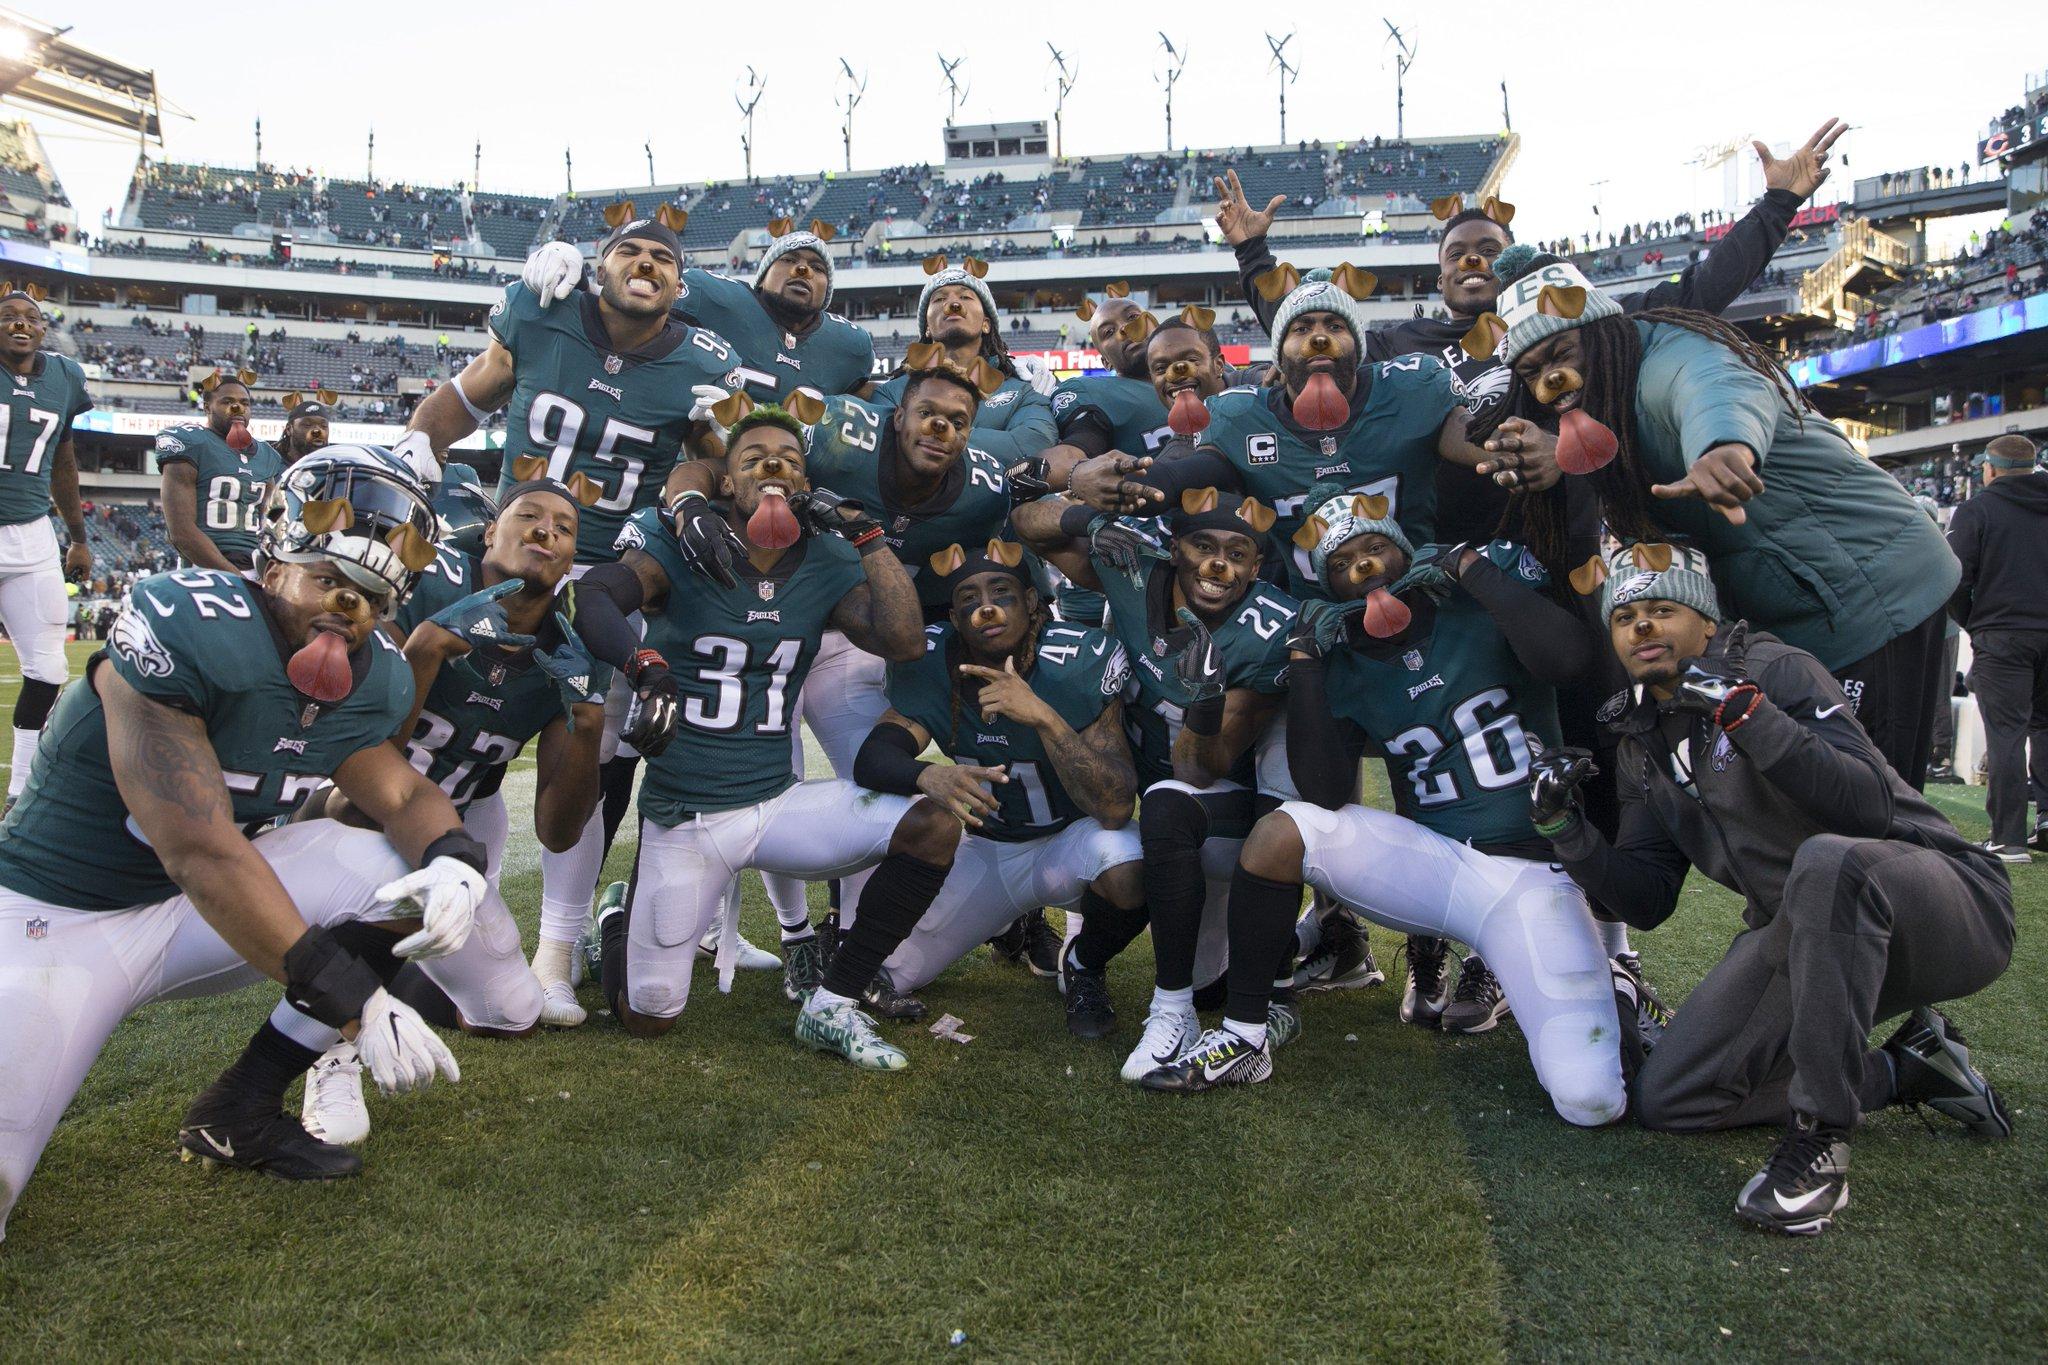 The #Eagles have no shortage of motivation #Underdogs https://t.co/ZG37c2vAxM https://t.co/UJyi6Cn7Ue